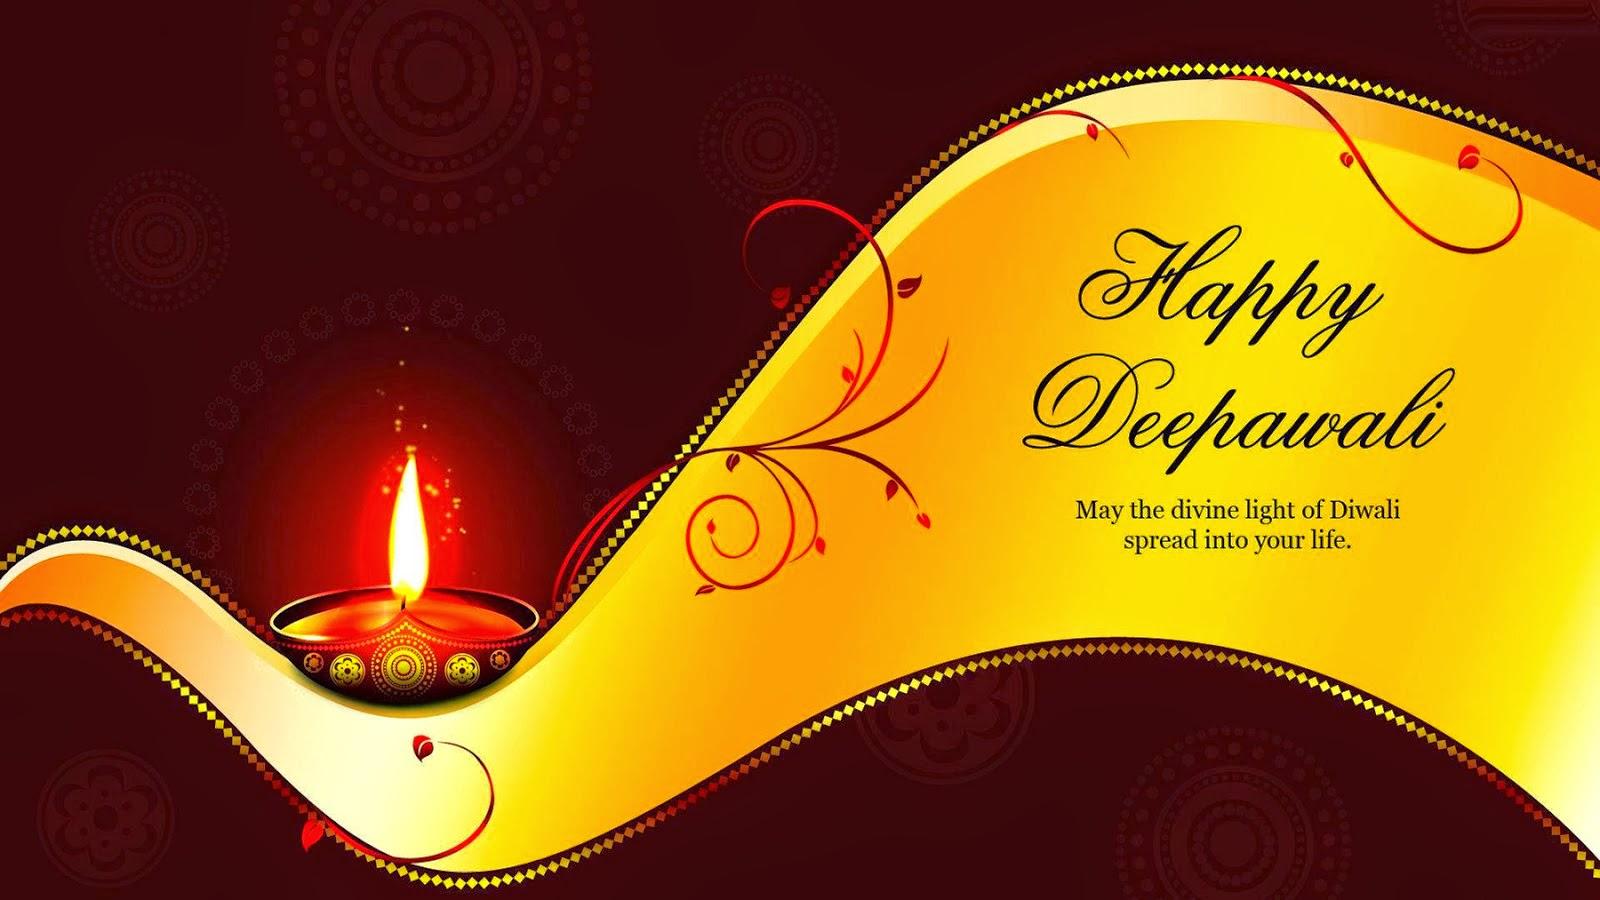 Deepavali 2015 Wallpaper Happy Diwali 2015 Wishes